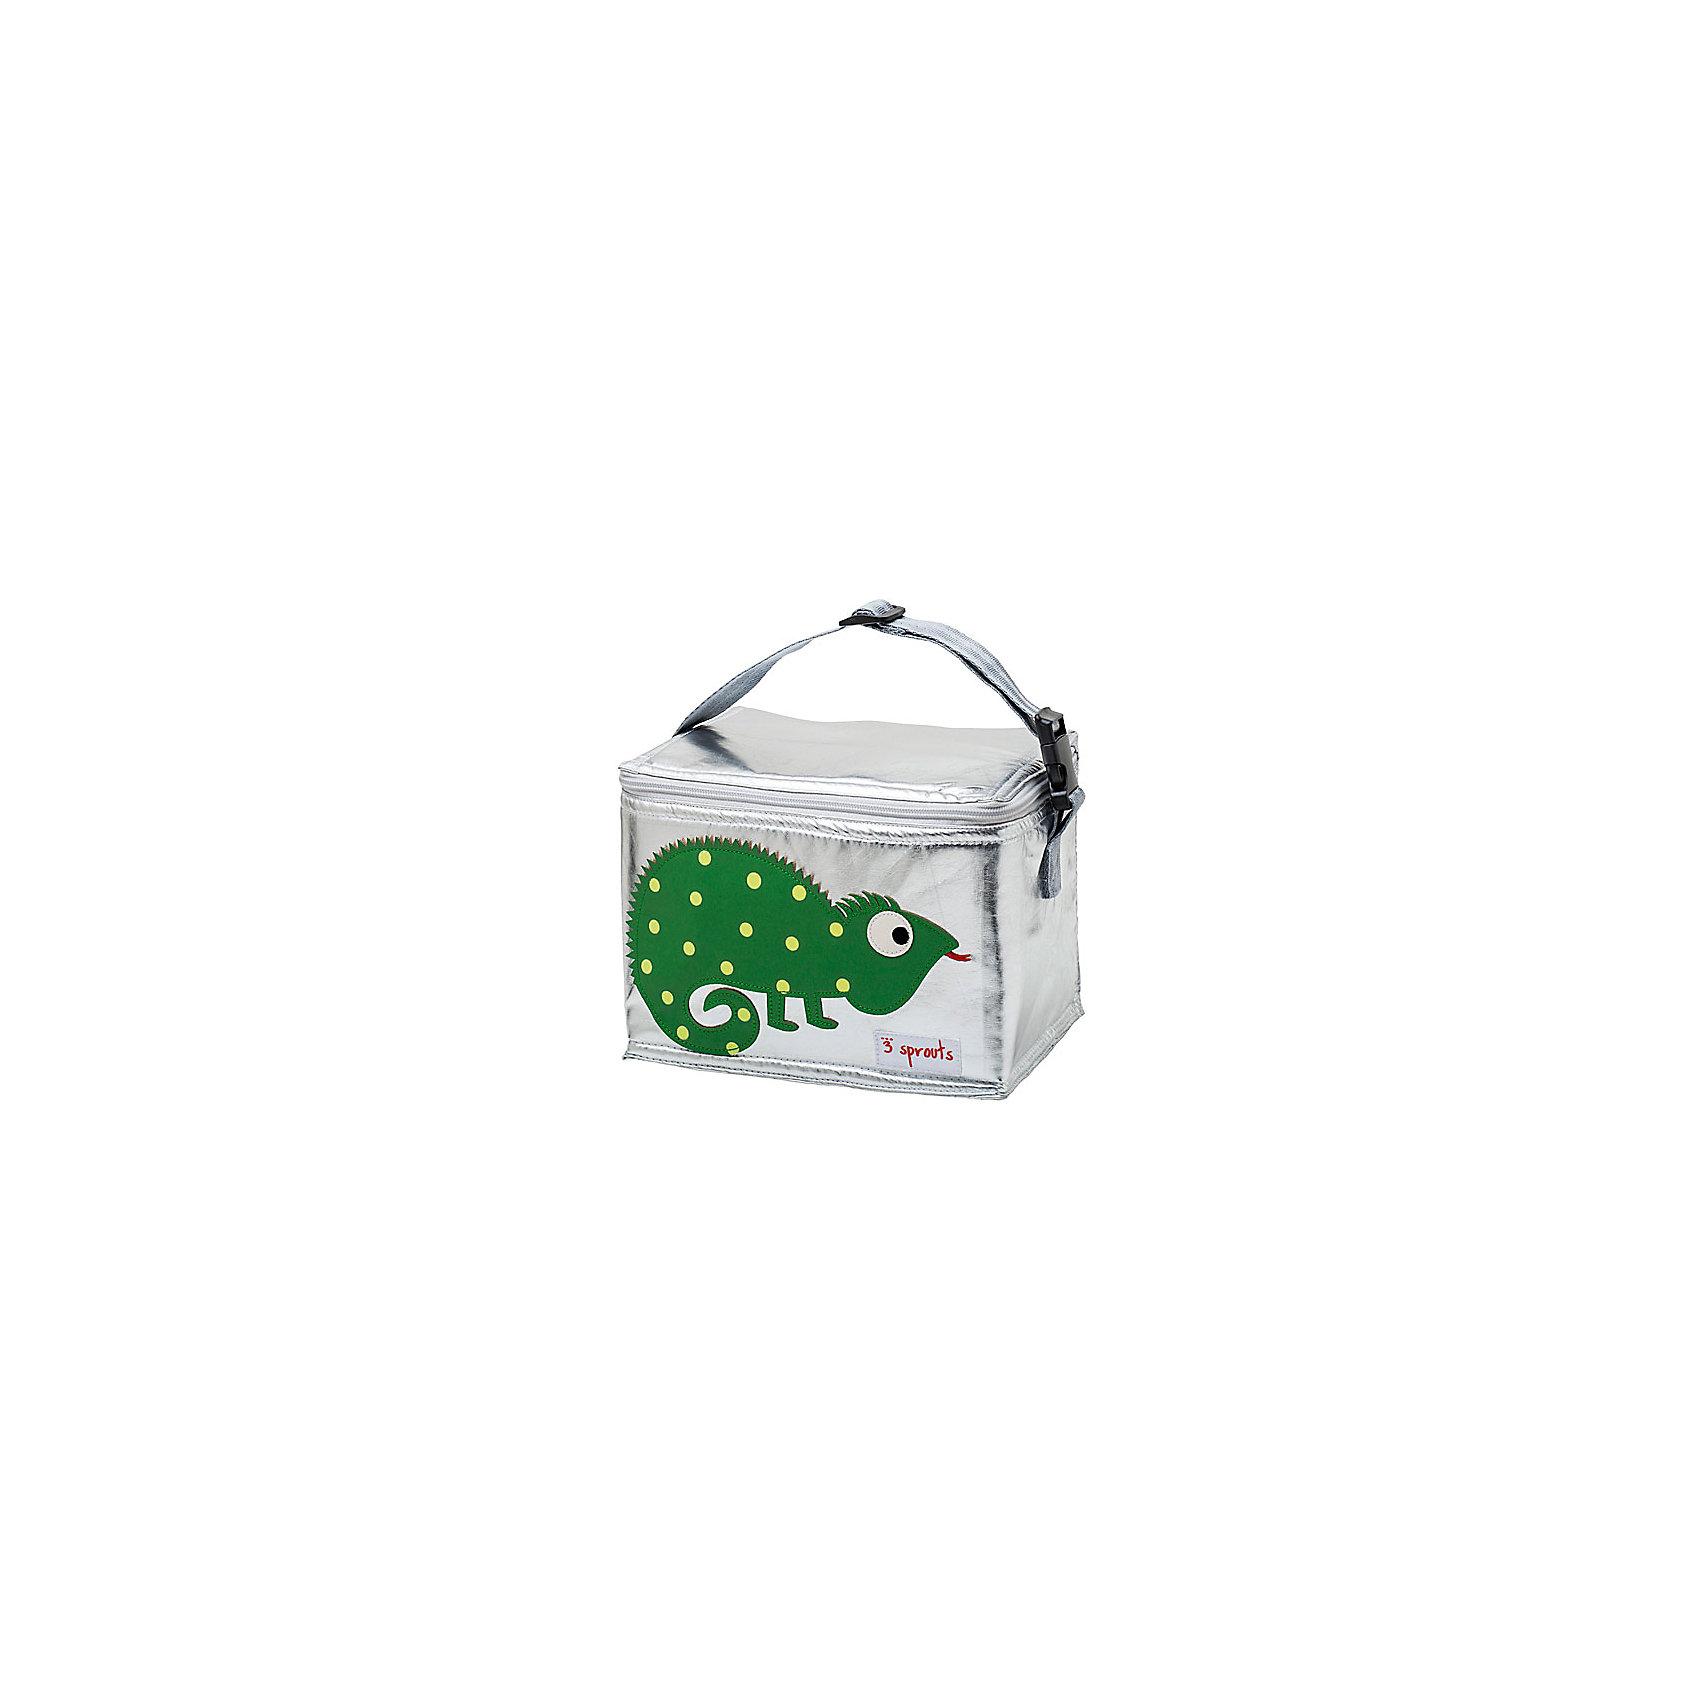 3 Sprouts Сумка для обеда Игуана (Green Iguana SPR1002), 3 Sprouts, зеленый купить gama 1002 в минске